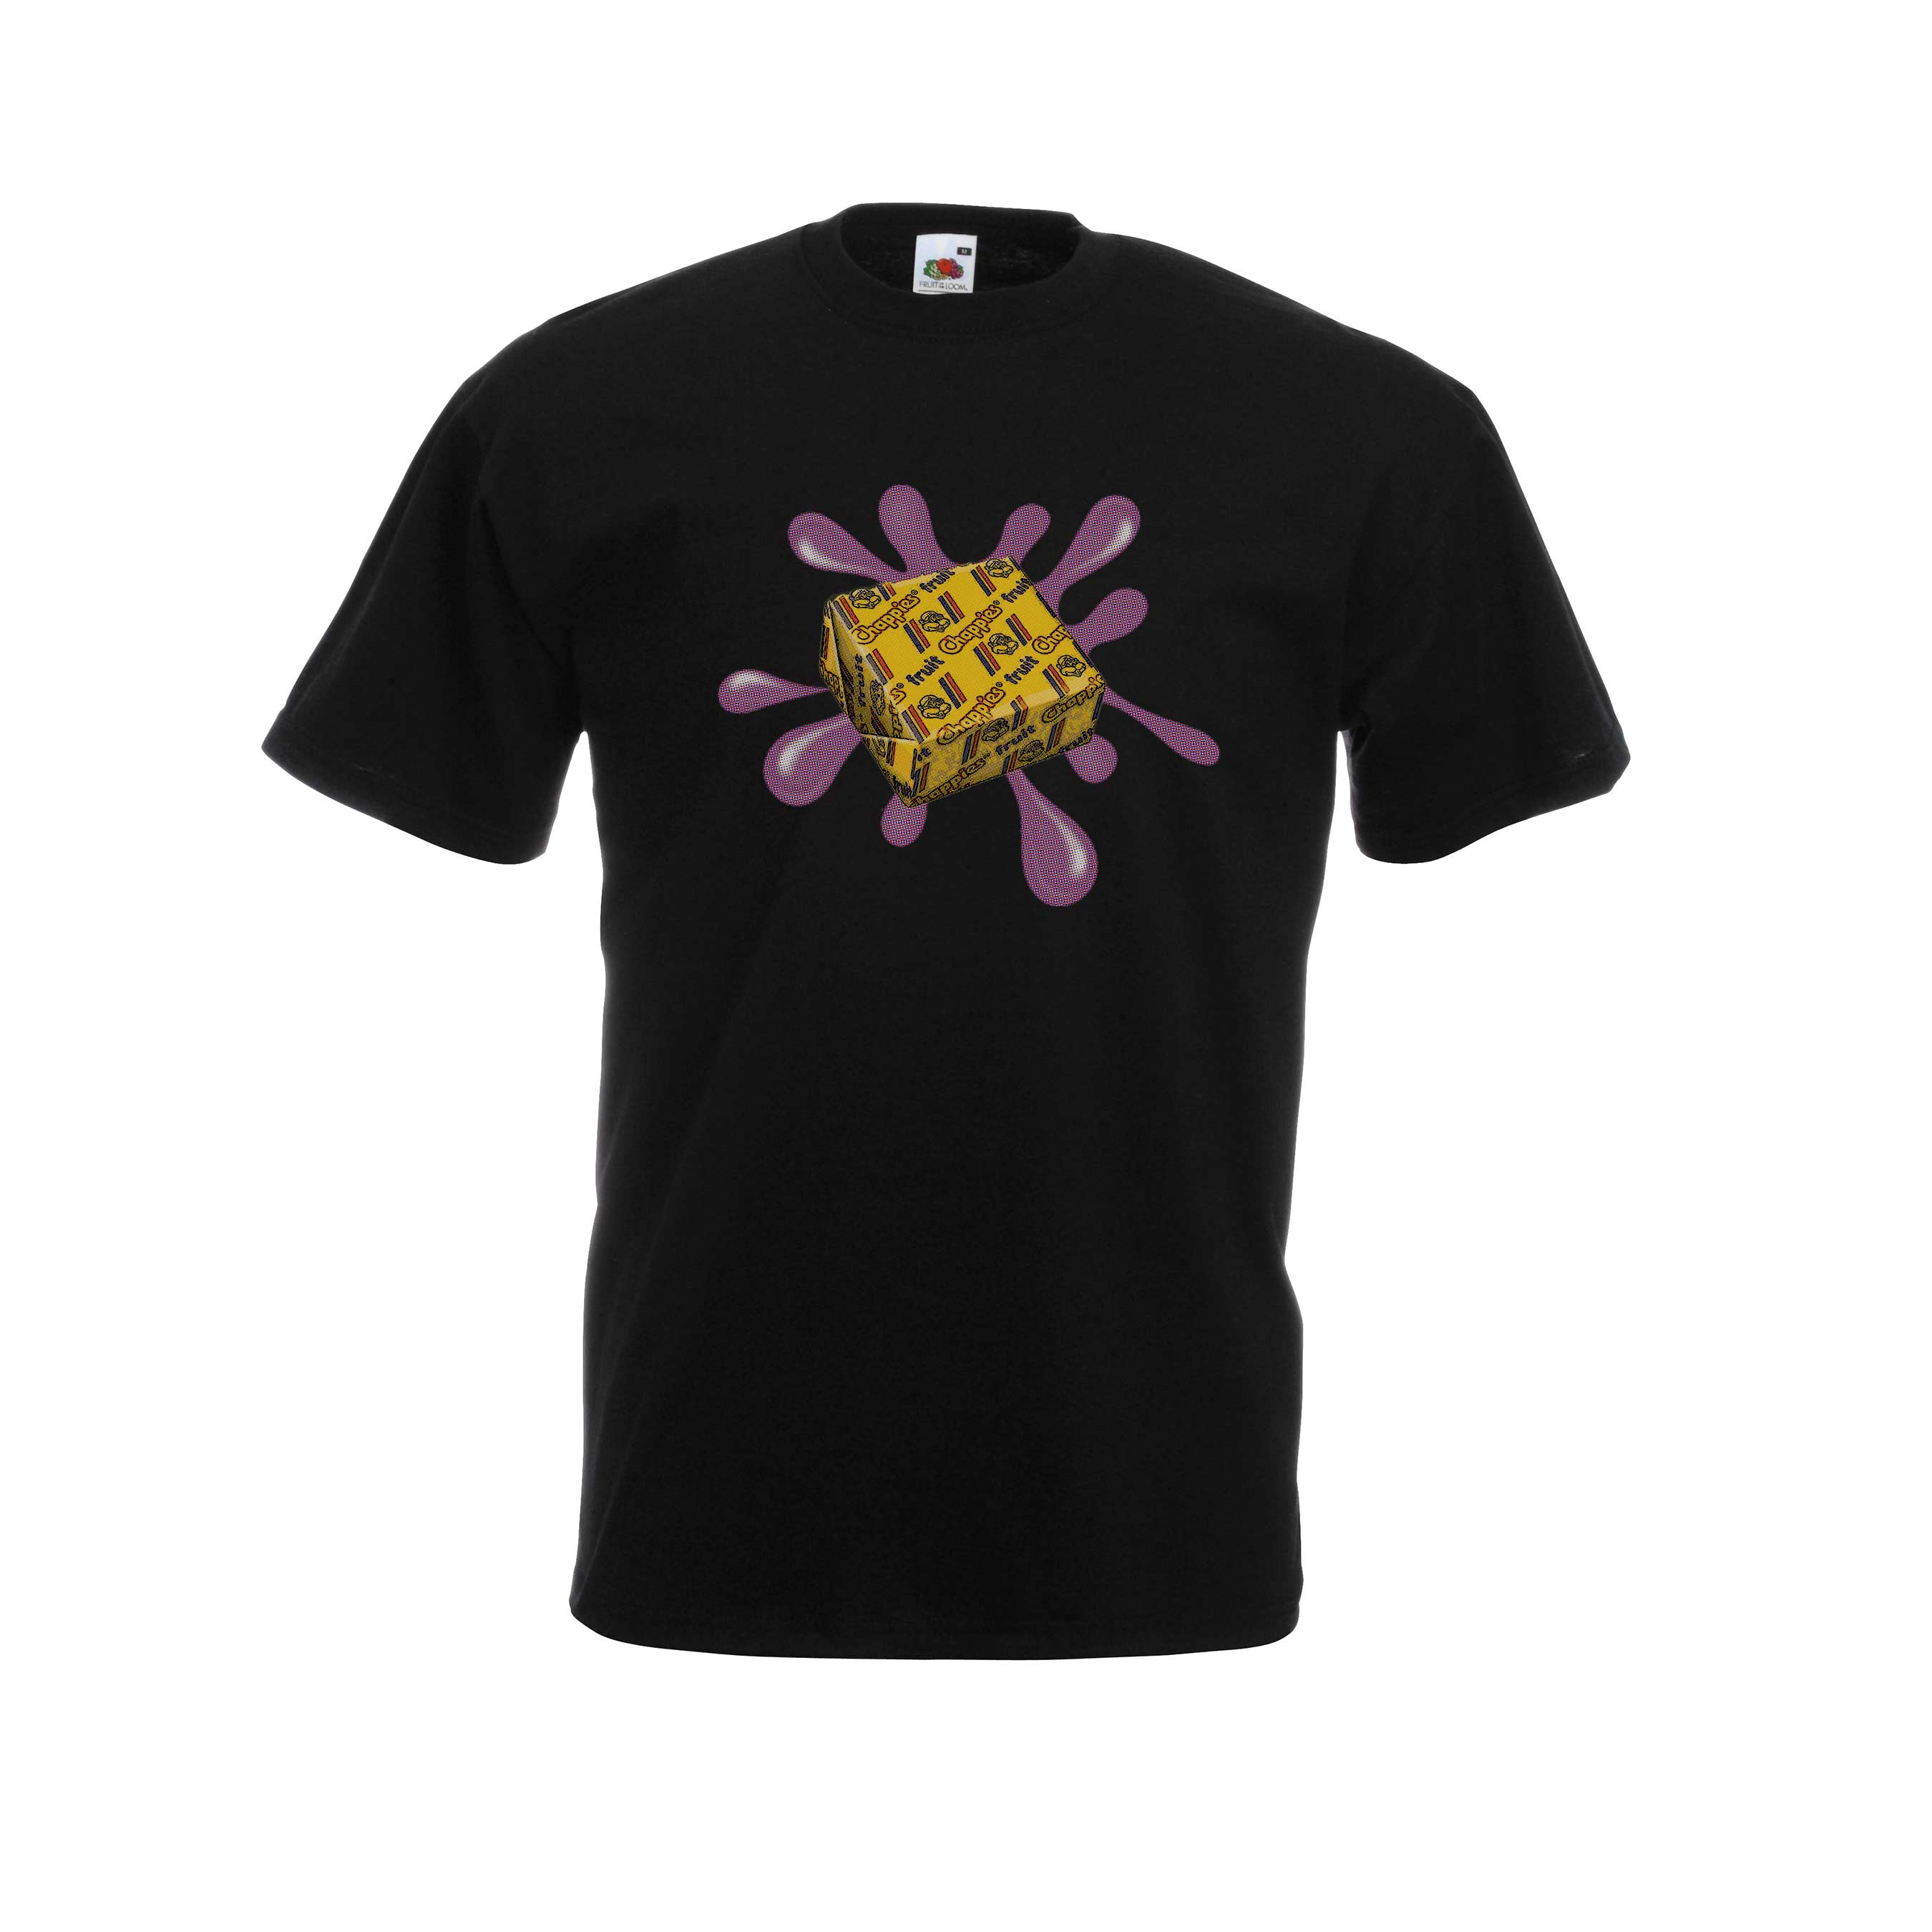 Chappies design for t-shirt, hoodie & sweatshirt